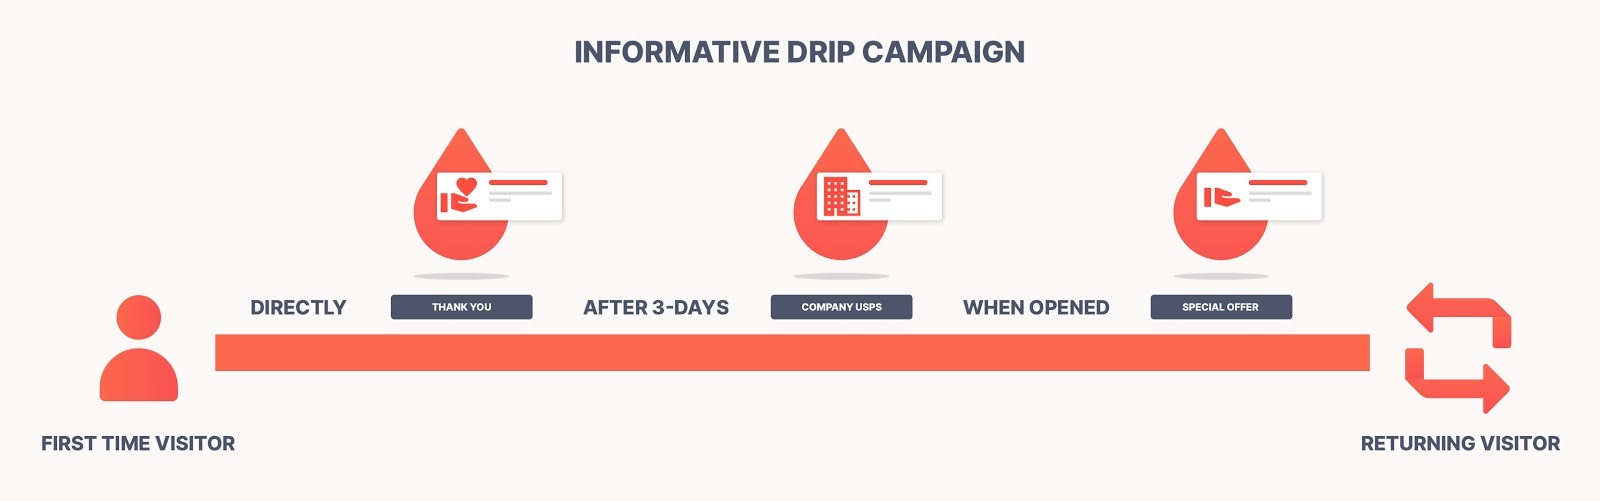 Informative drip campaign illustration